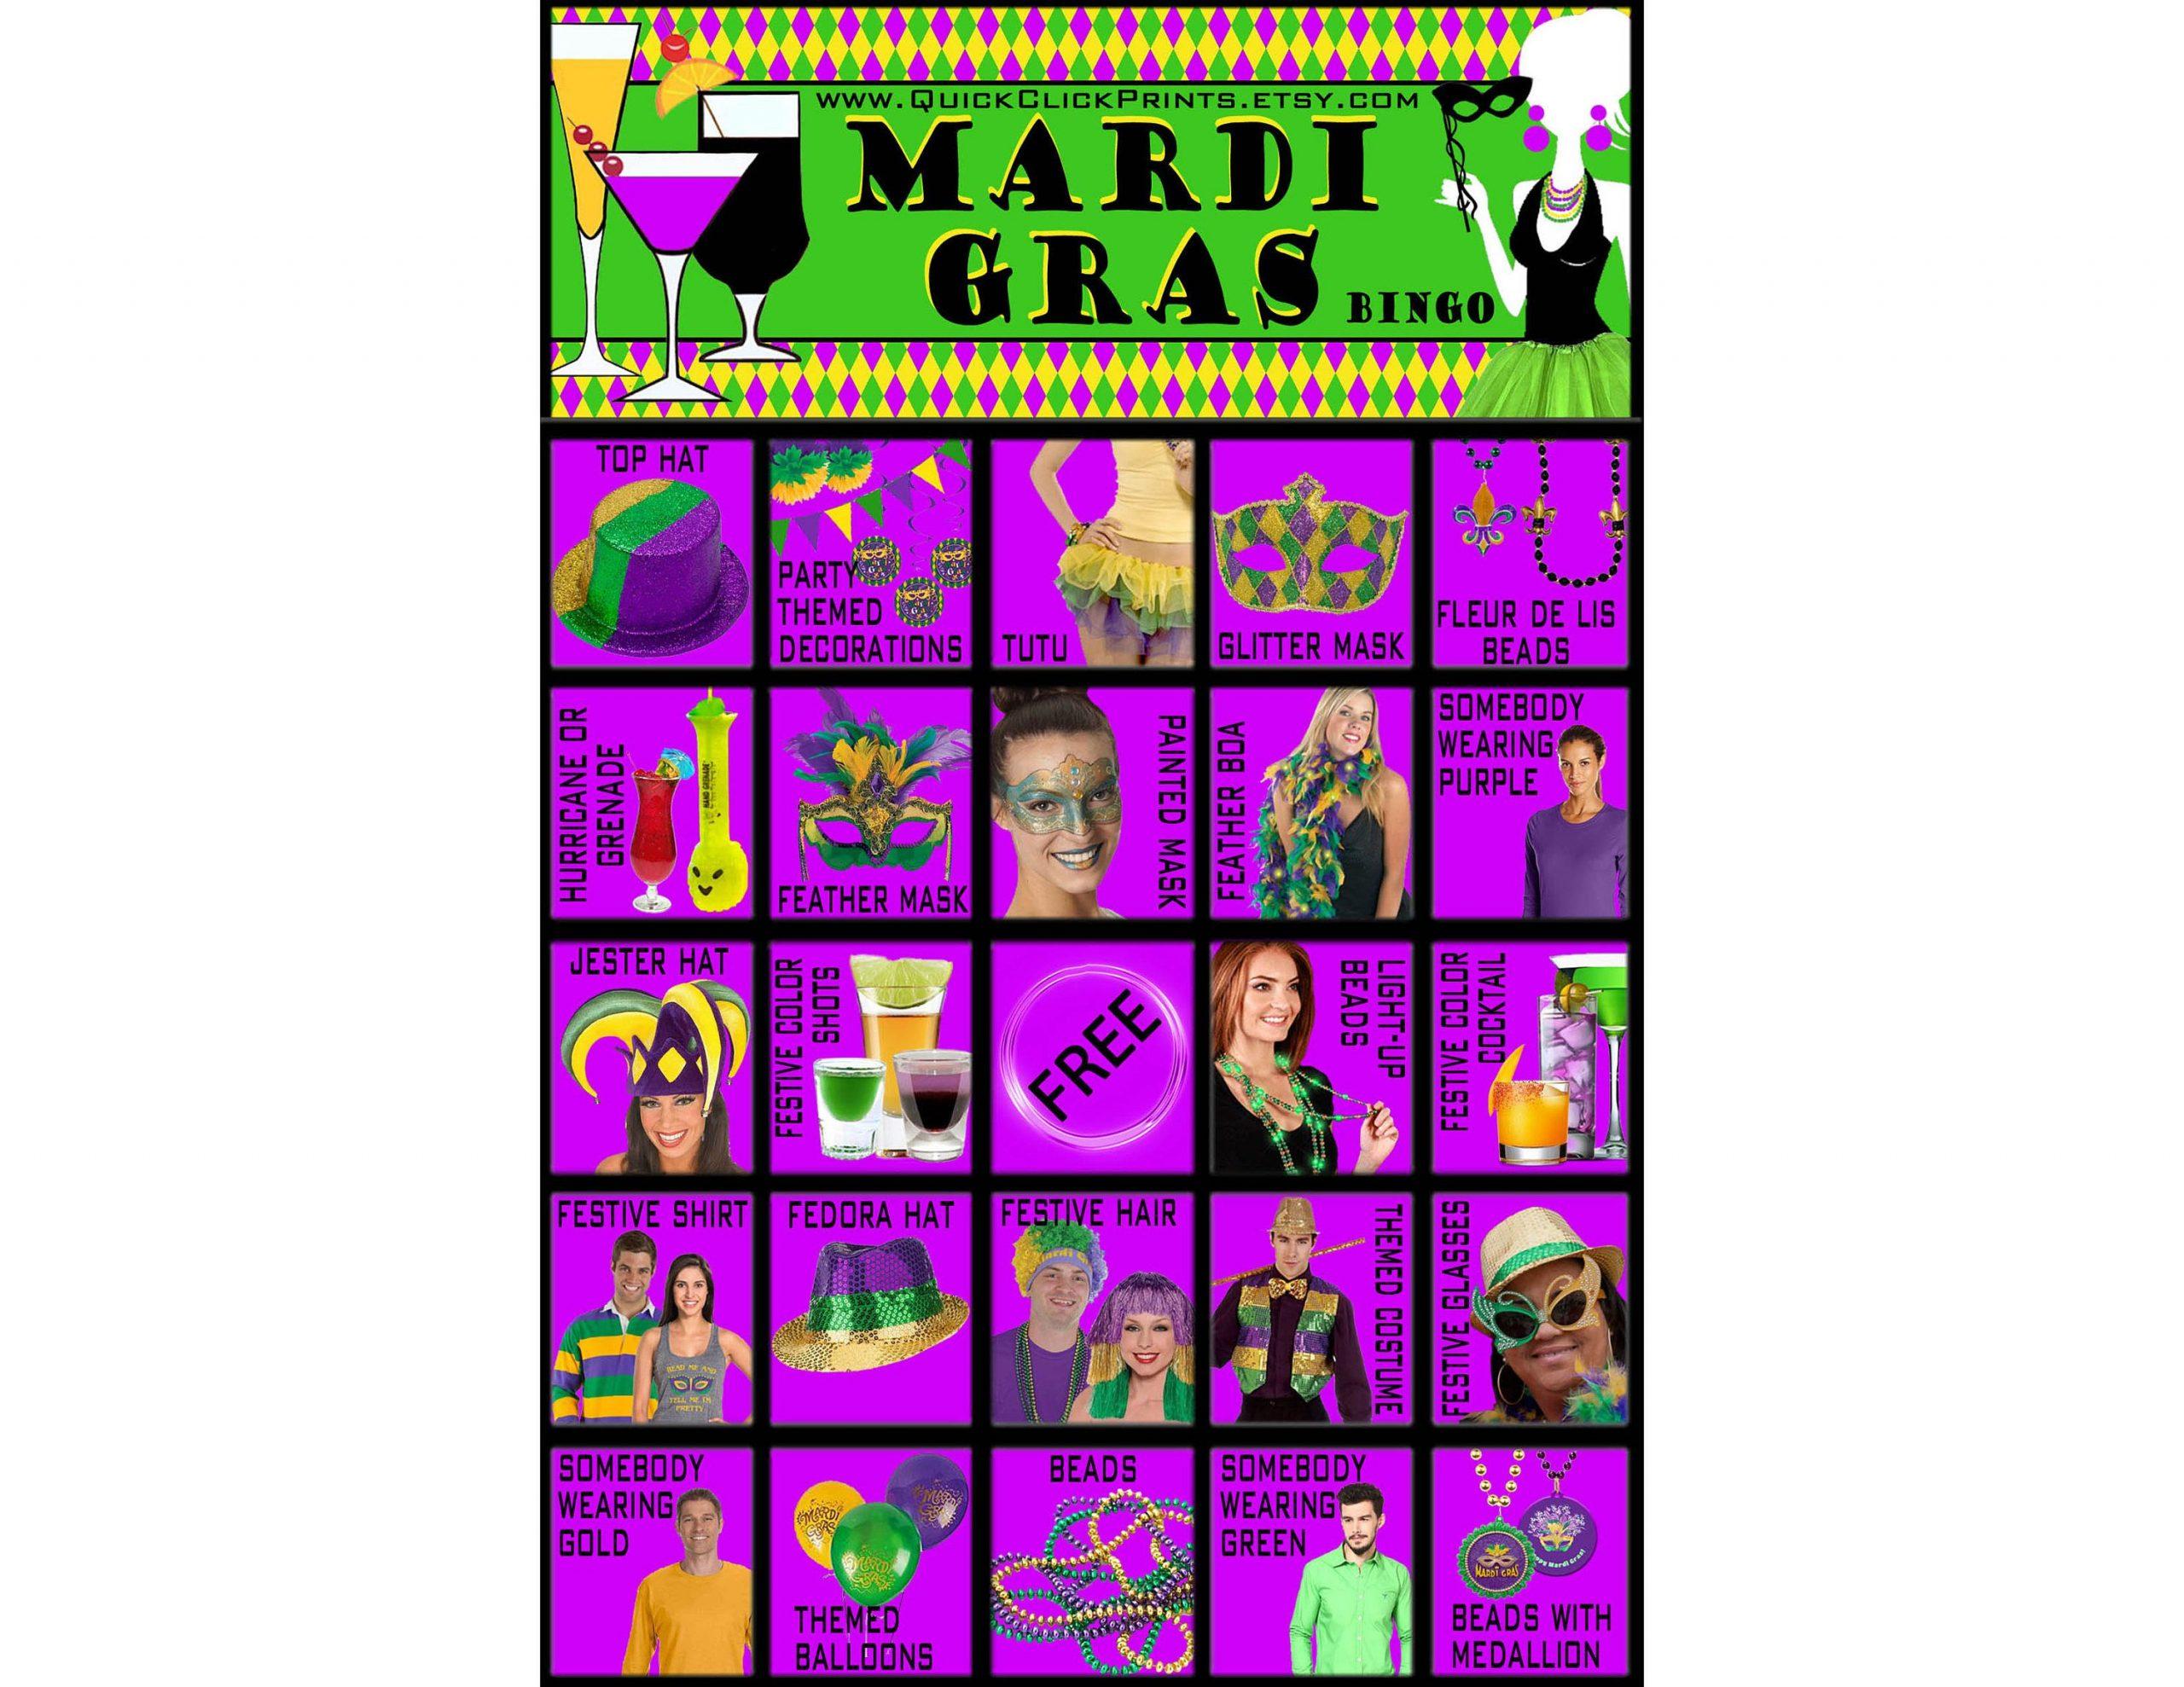 Mardi Gras Bingo - 30 Cards - Mardi Gras People Watching